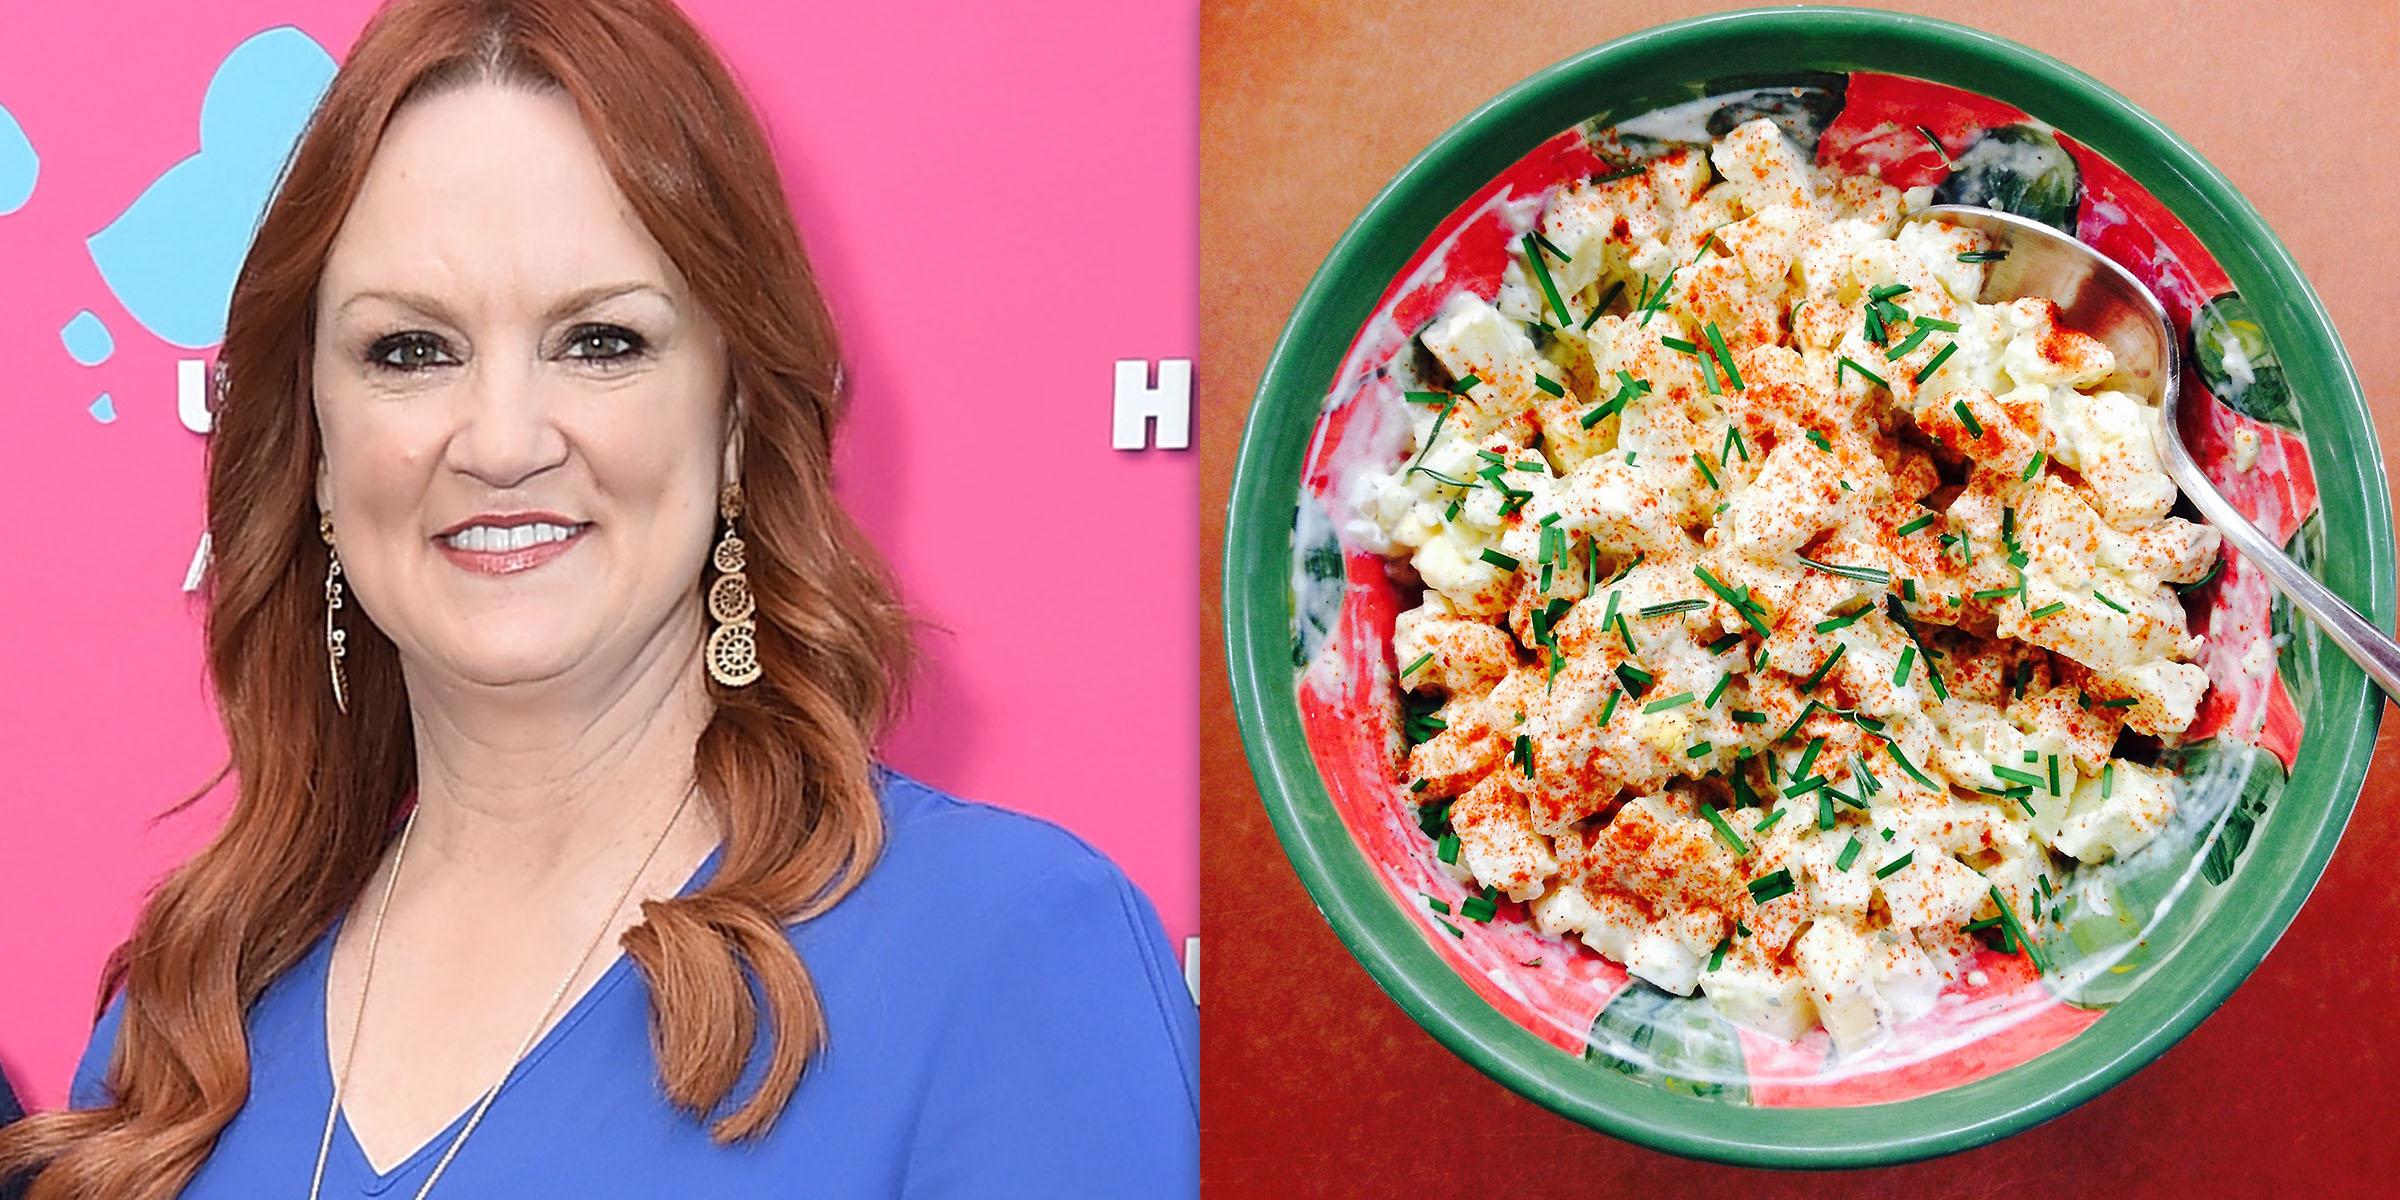 Ree Drummond S New Potato Salad Recipe Has A Very Unusual Ingredient